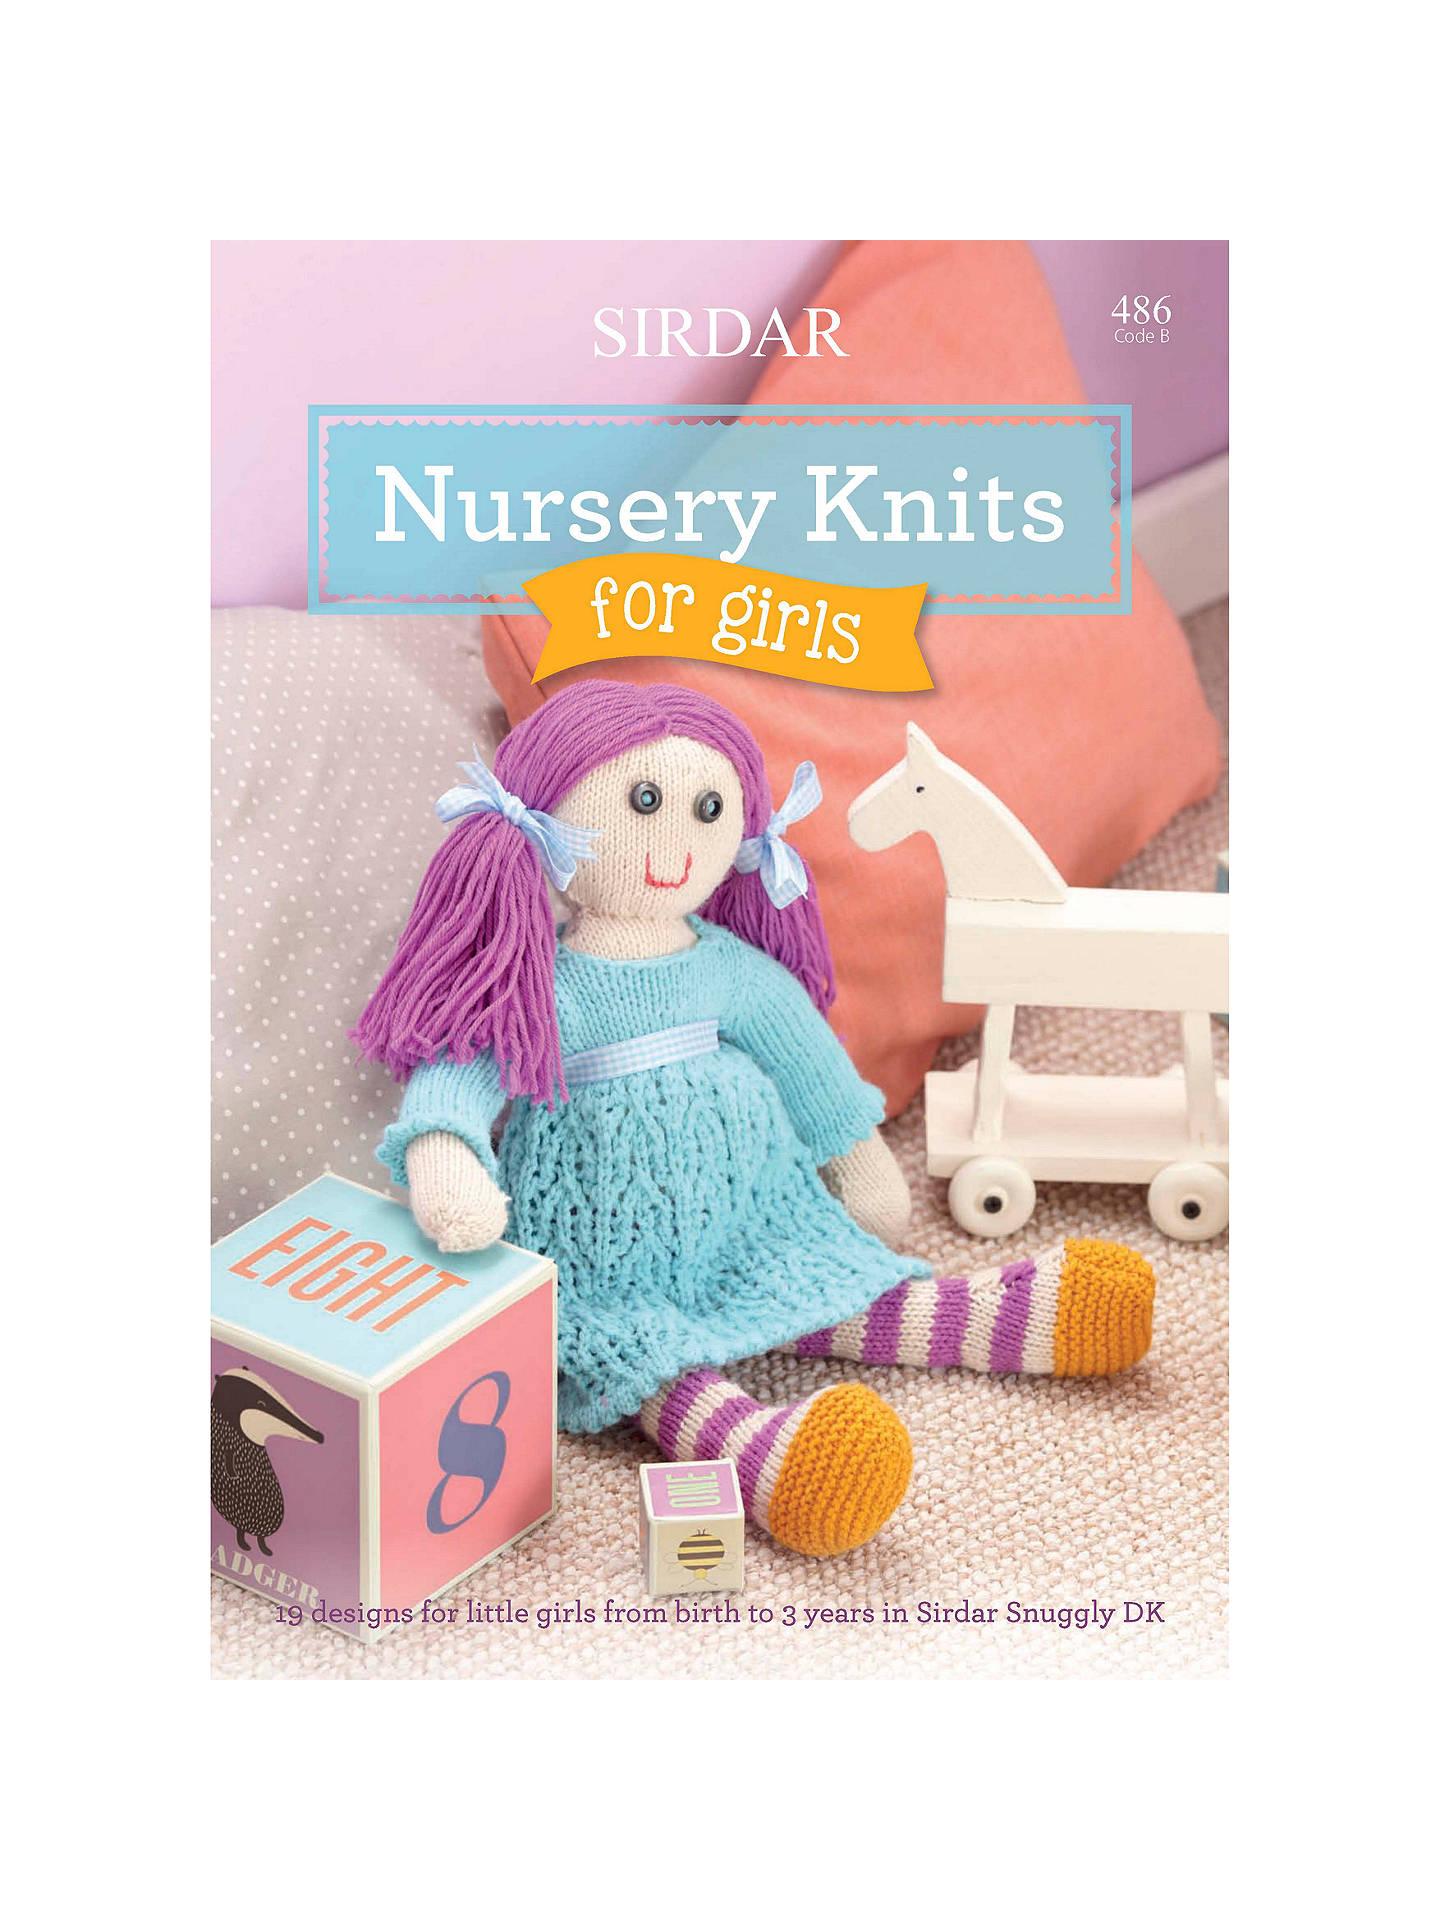 Sirdar Nursery Knits For Girls Knitting Pattern Booklet 0486 At